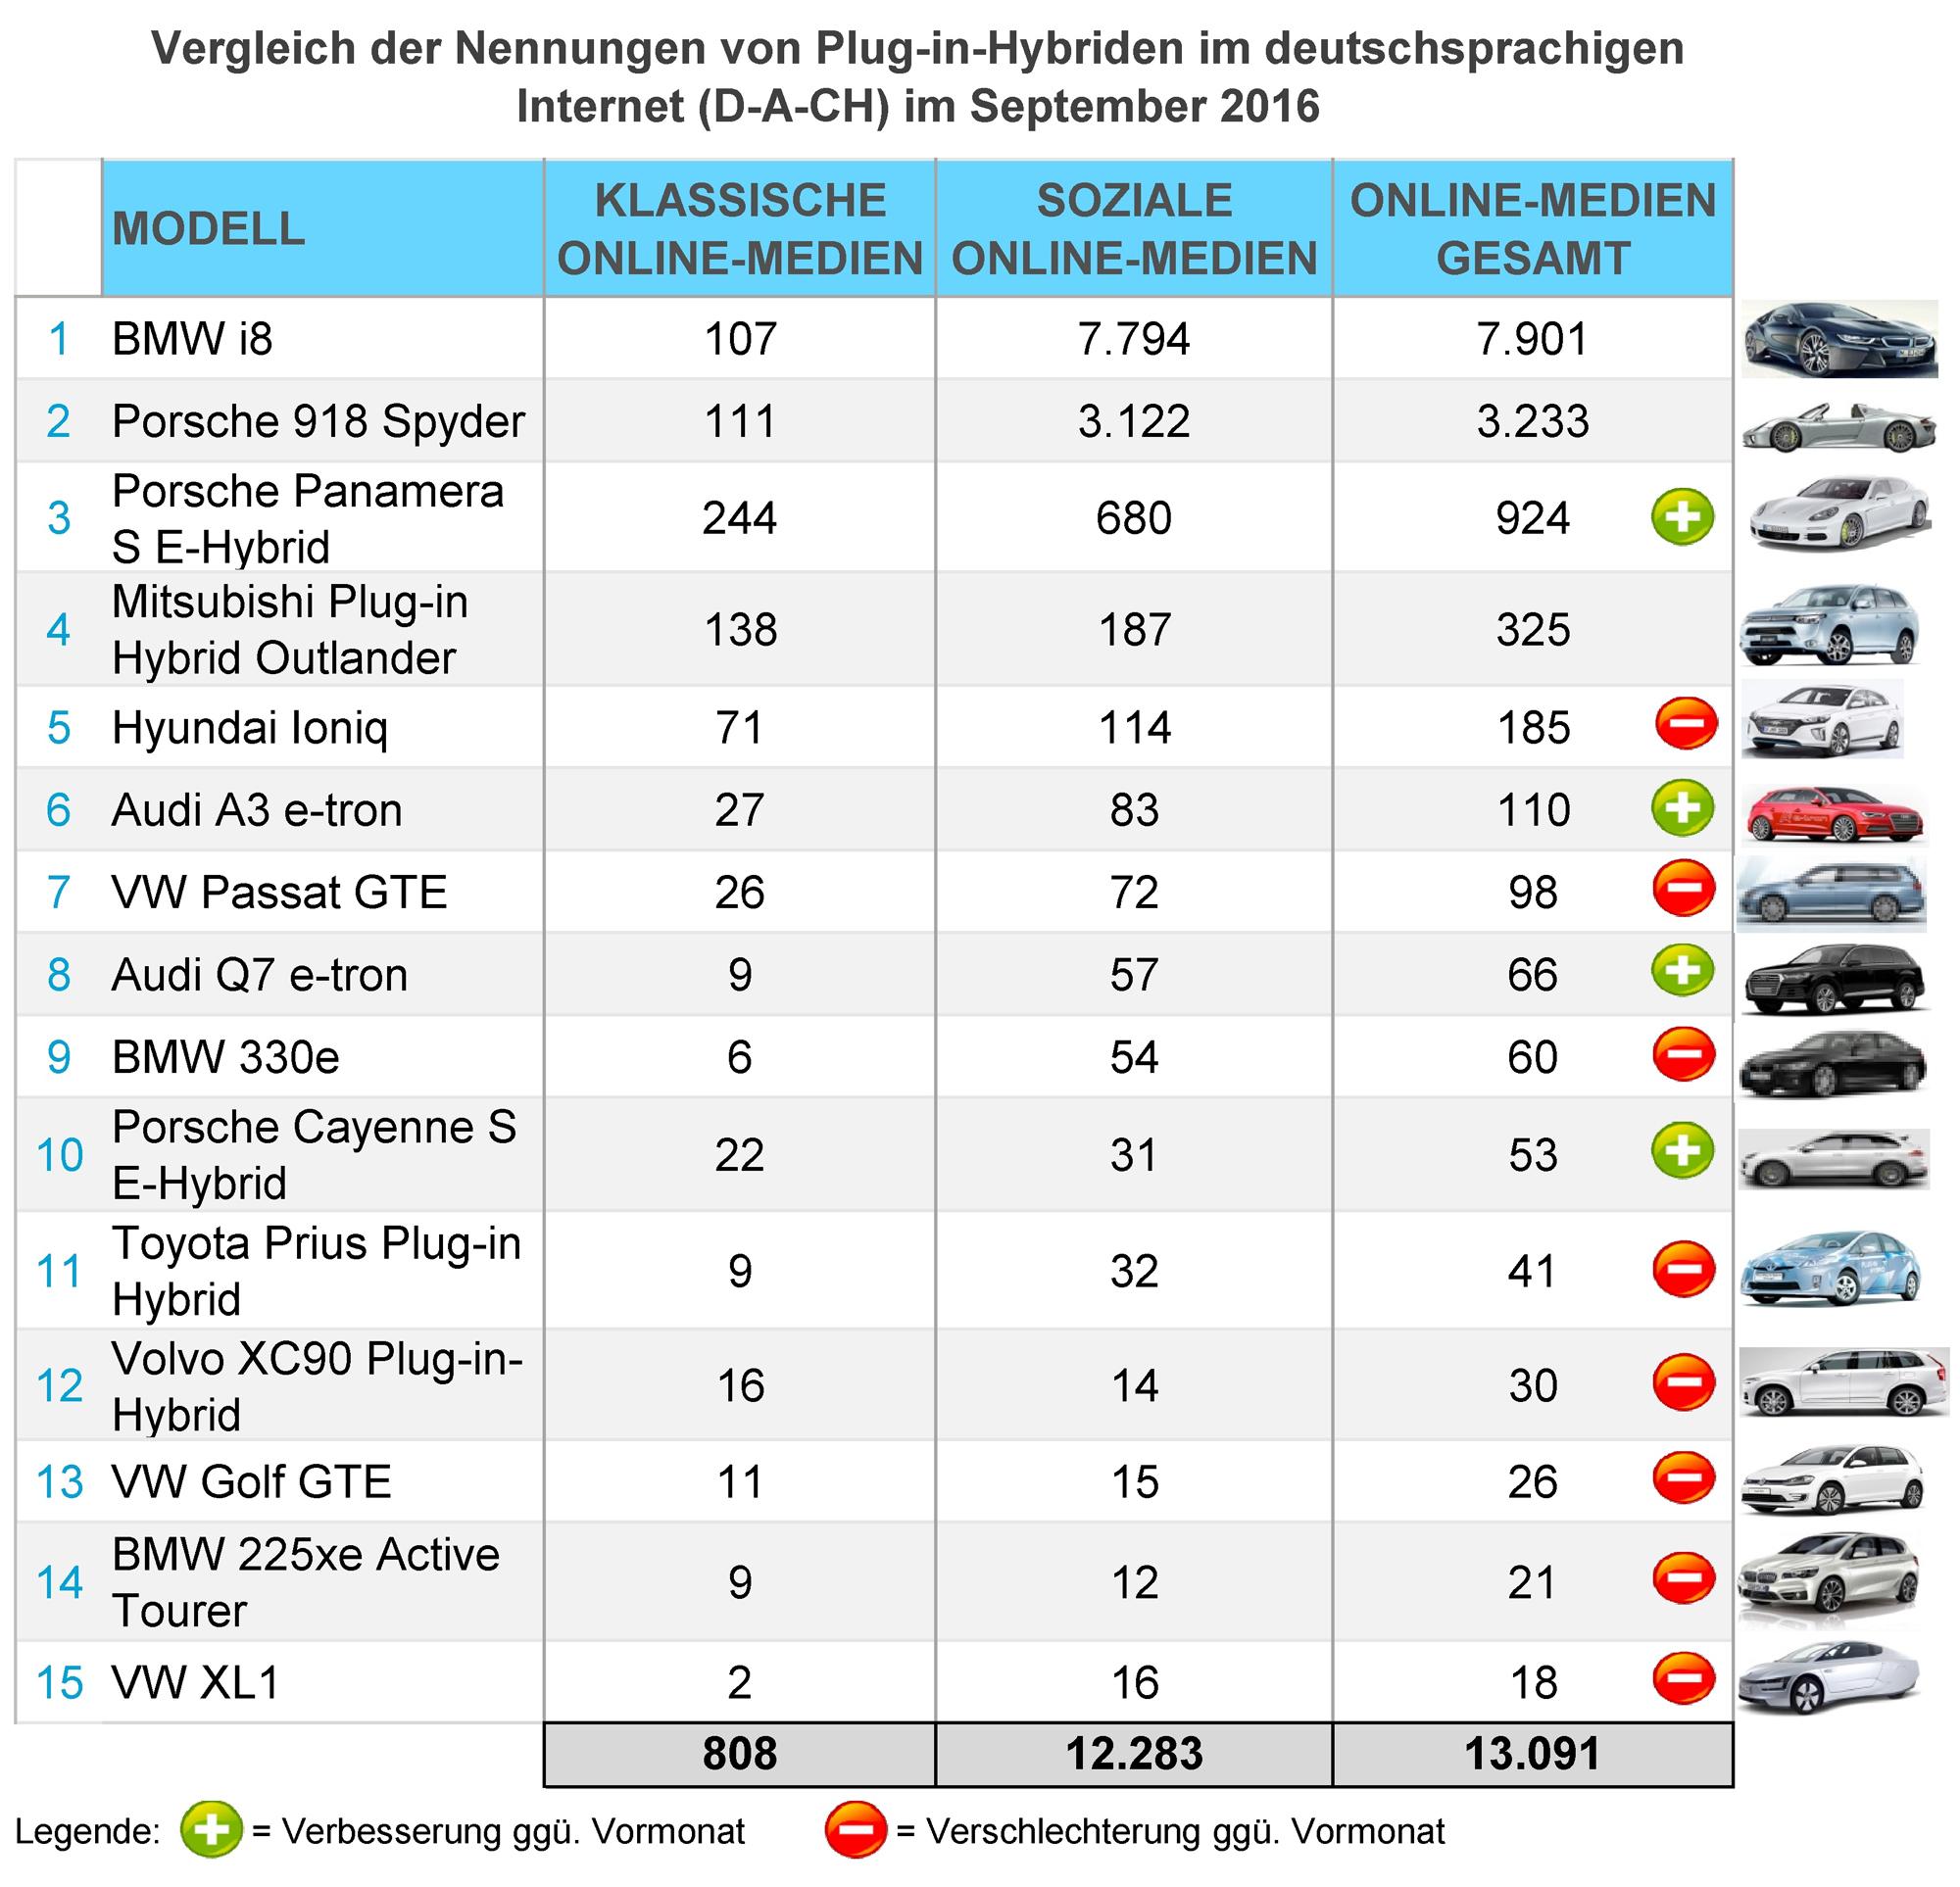 eMobility-Buzz-September-2016-Plugin